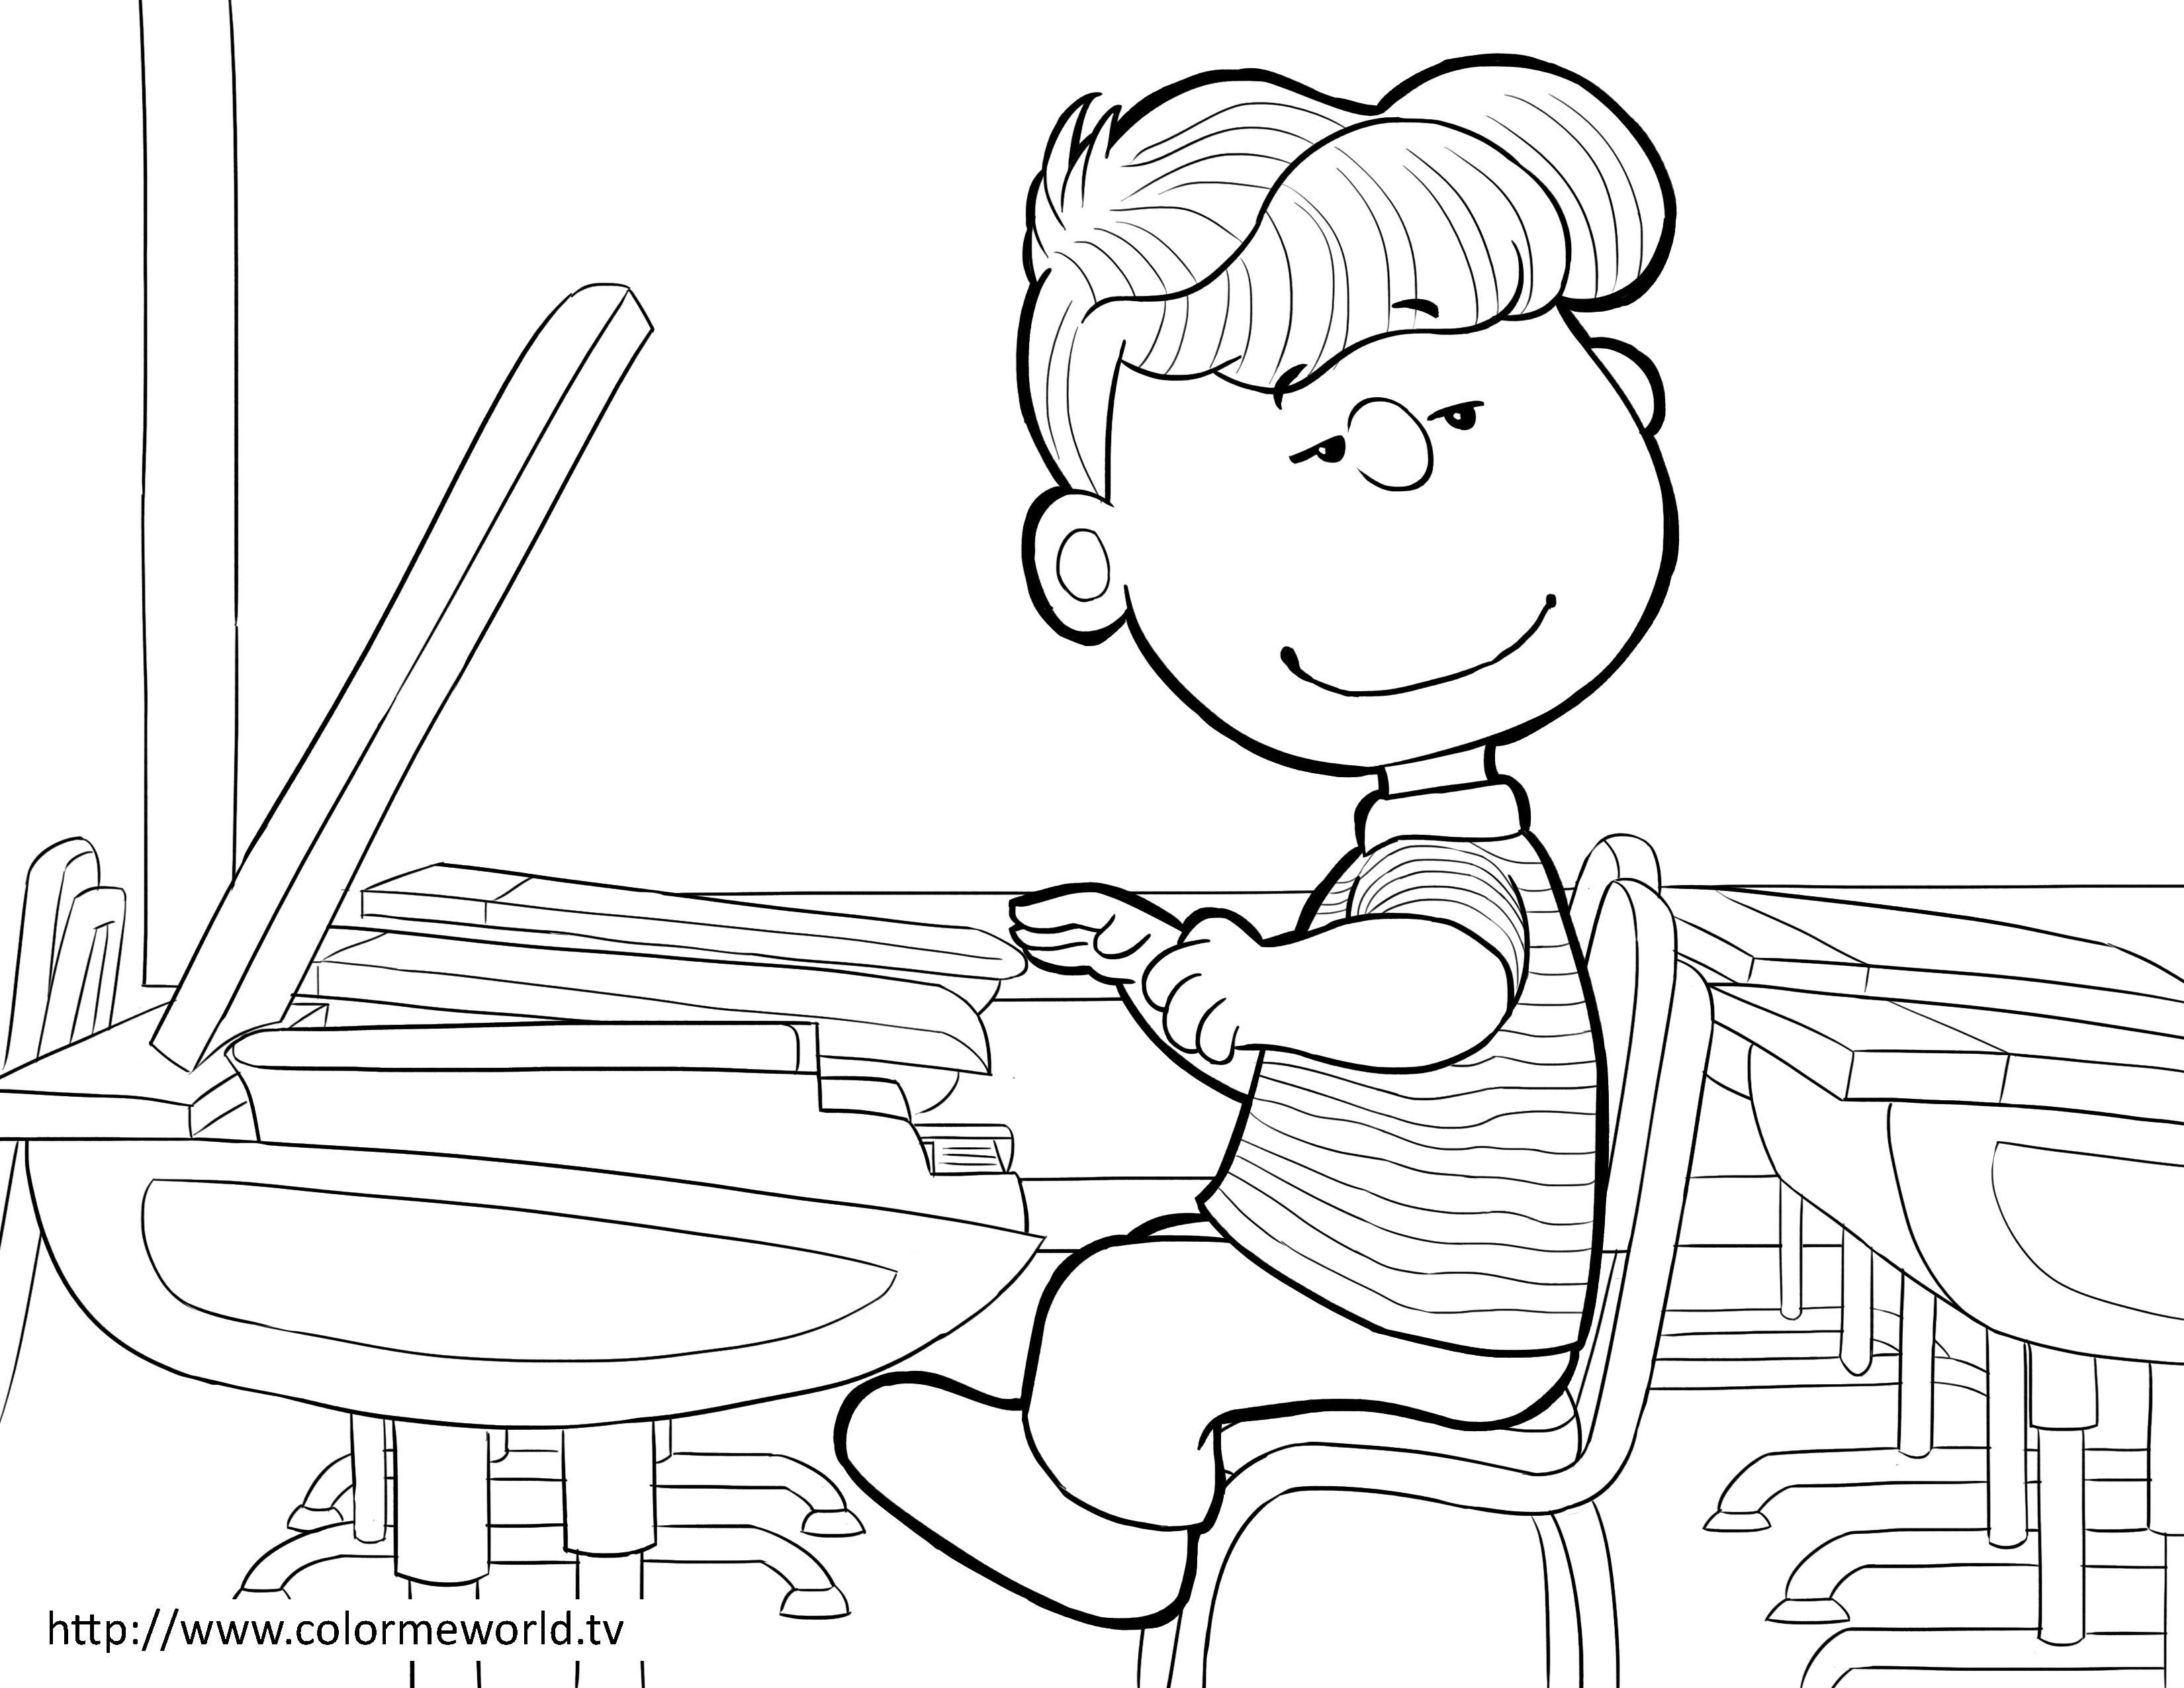 Schroeder PDF Printable Coloring Page - Peanuts | Peanuts Coloring ...